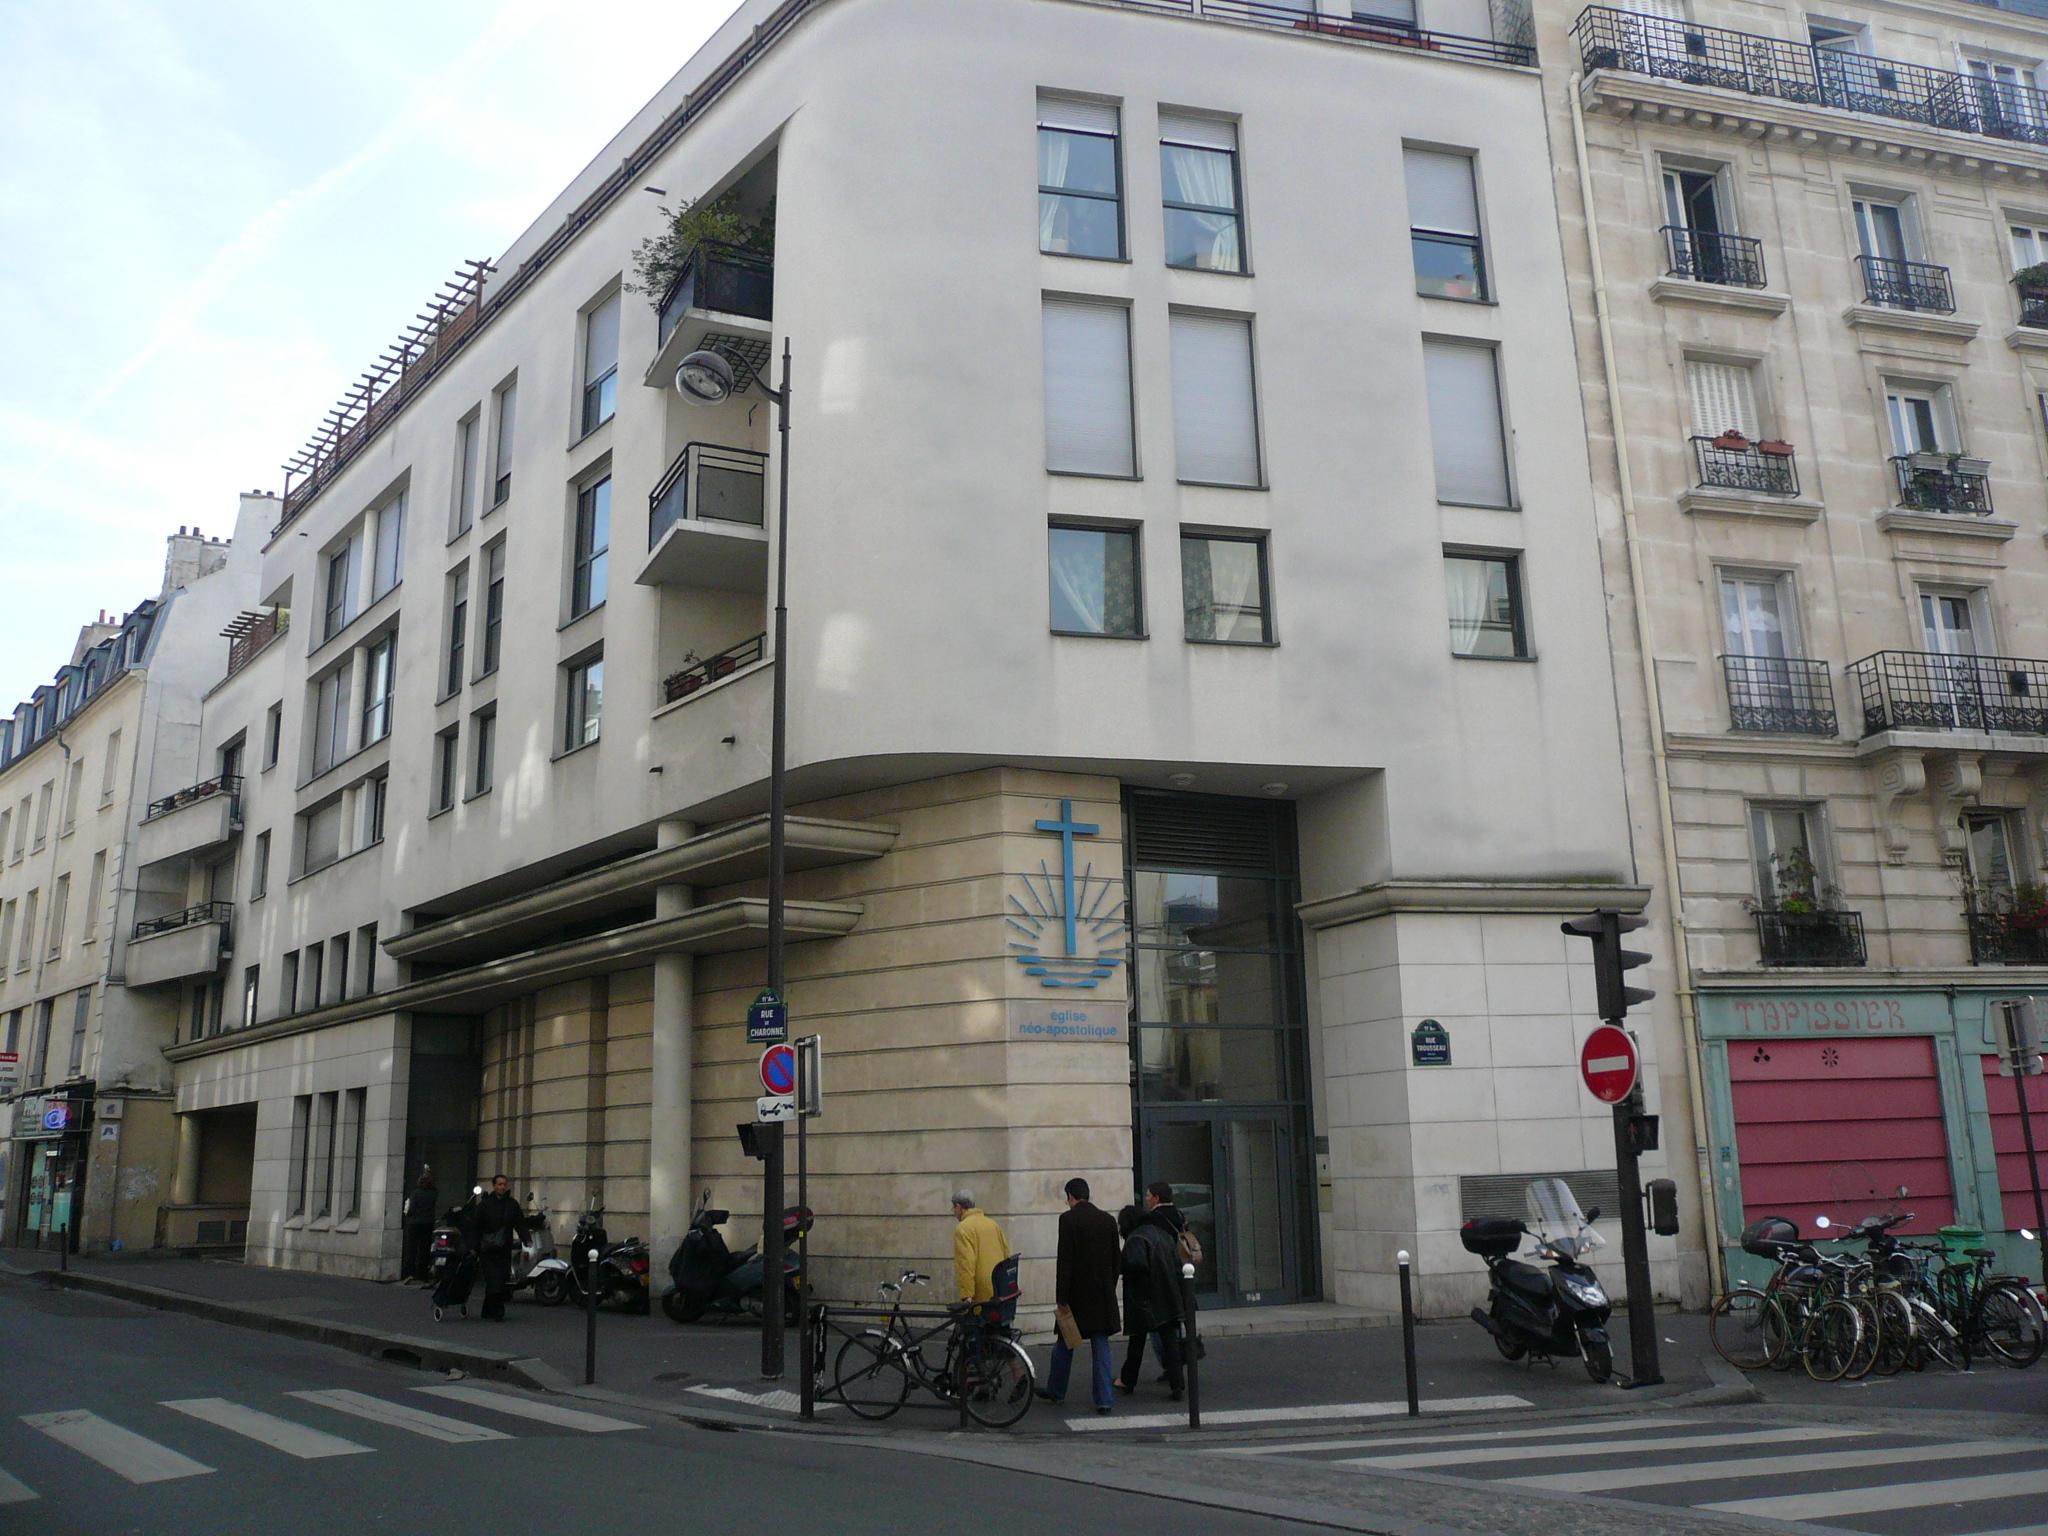 Tapissier Paris 20 file:new apostolic church 1, paris 16 march 2008